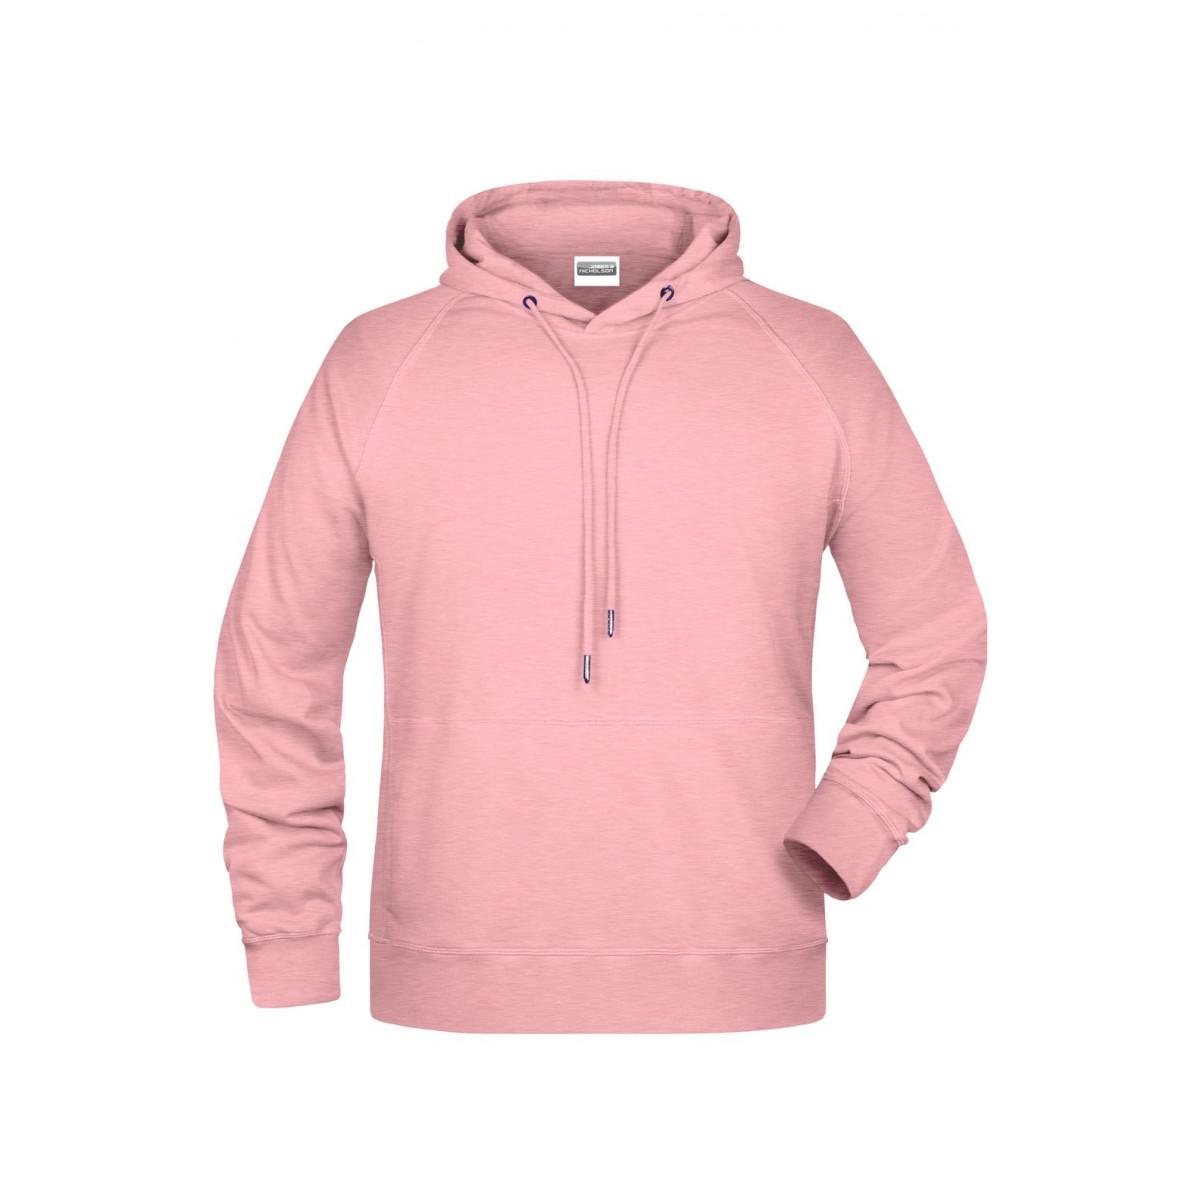 Толстовка мужская 8024 Mens Hoody - Нежно-розовый